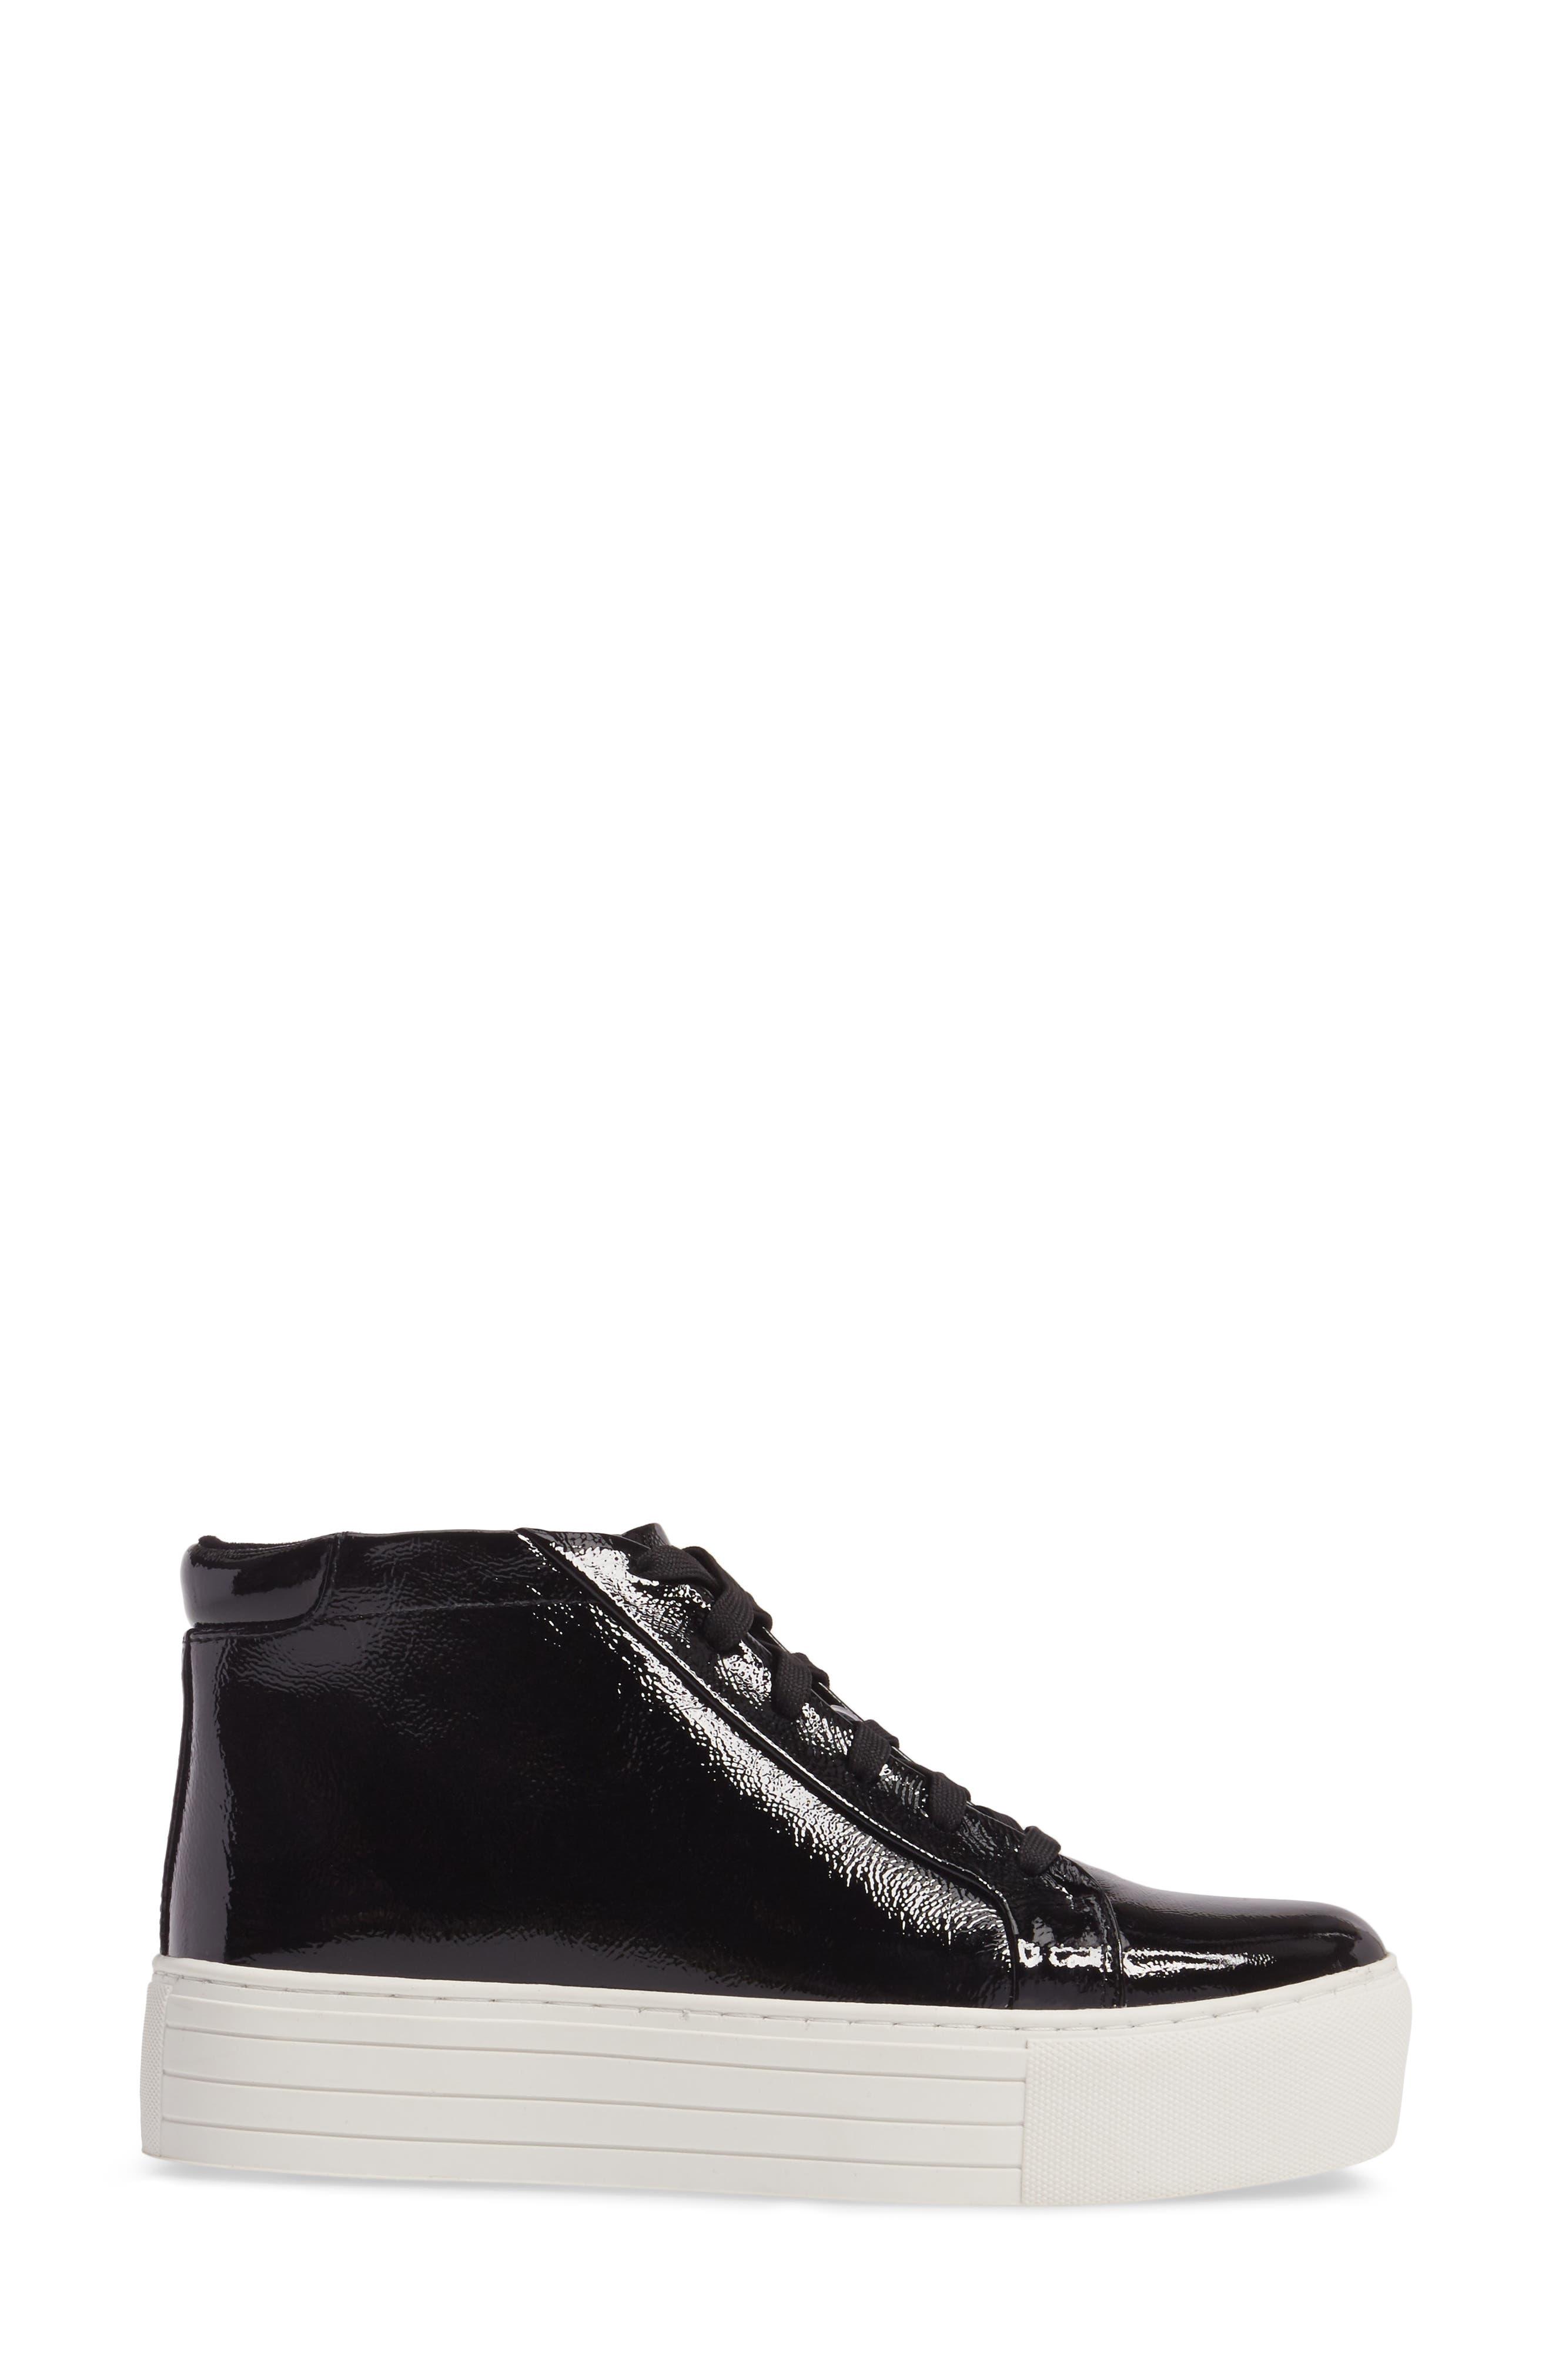 Janette High Top Platform Sneaker,                             Alternate thumbnail 3, color,                             BLACK PATENT LEATHER